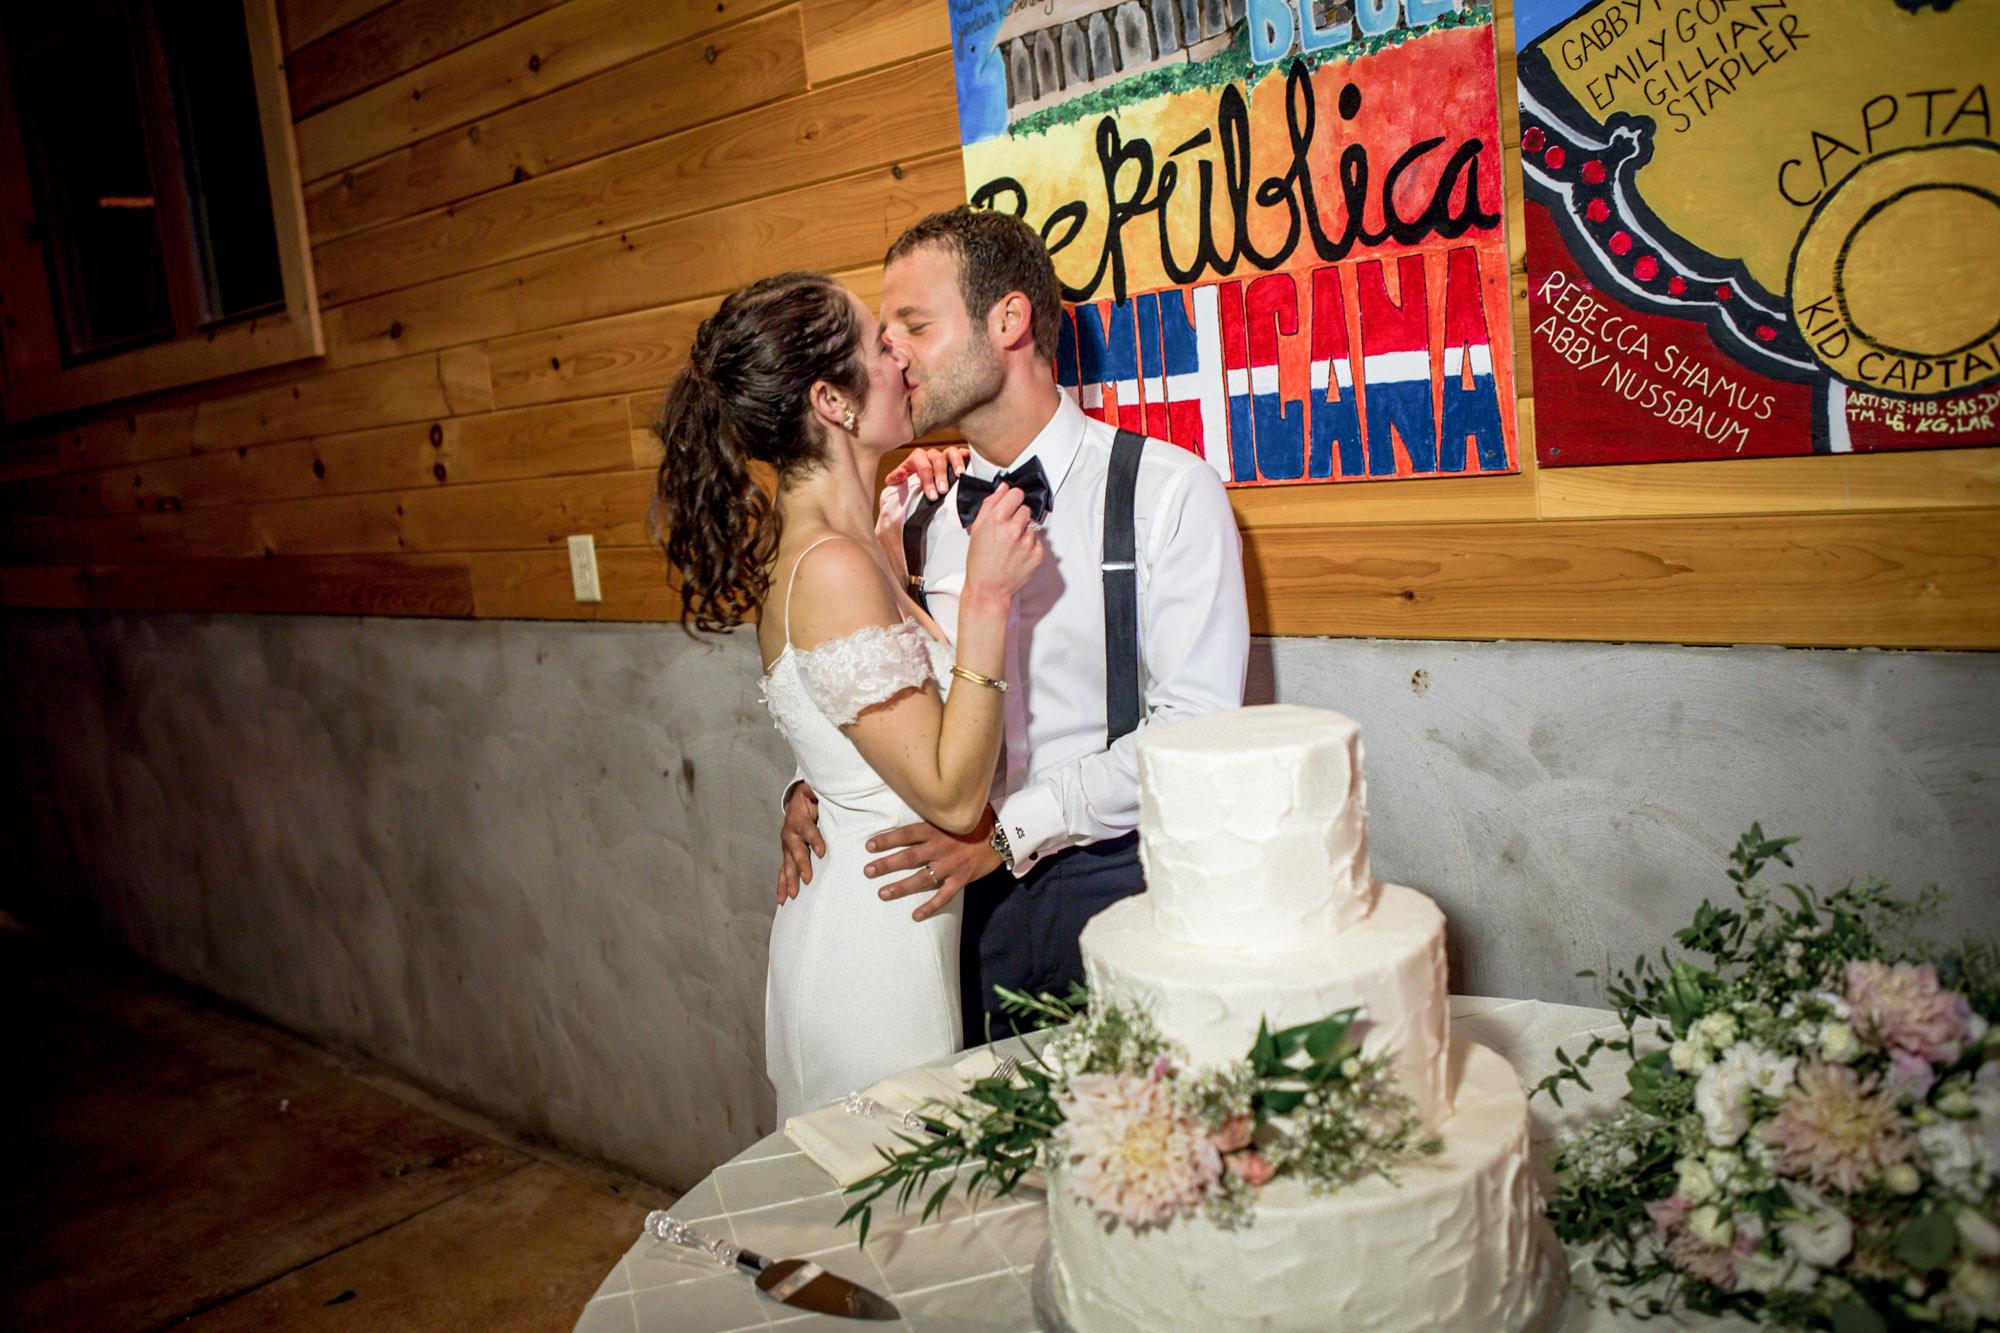 scranton_wedding_photographer_lettieri_pa (33 of 34).jpg